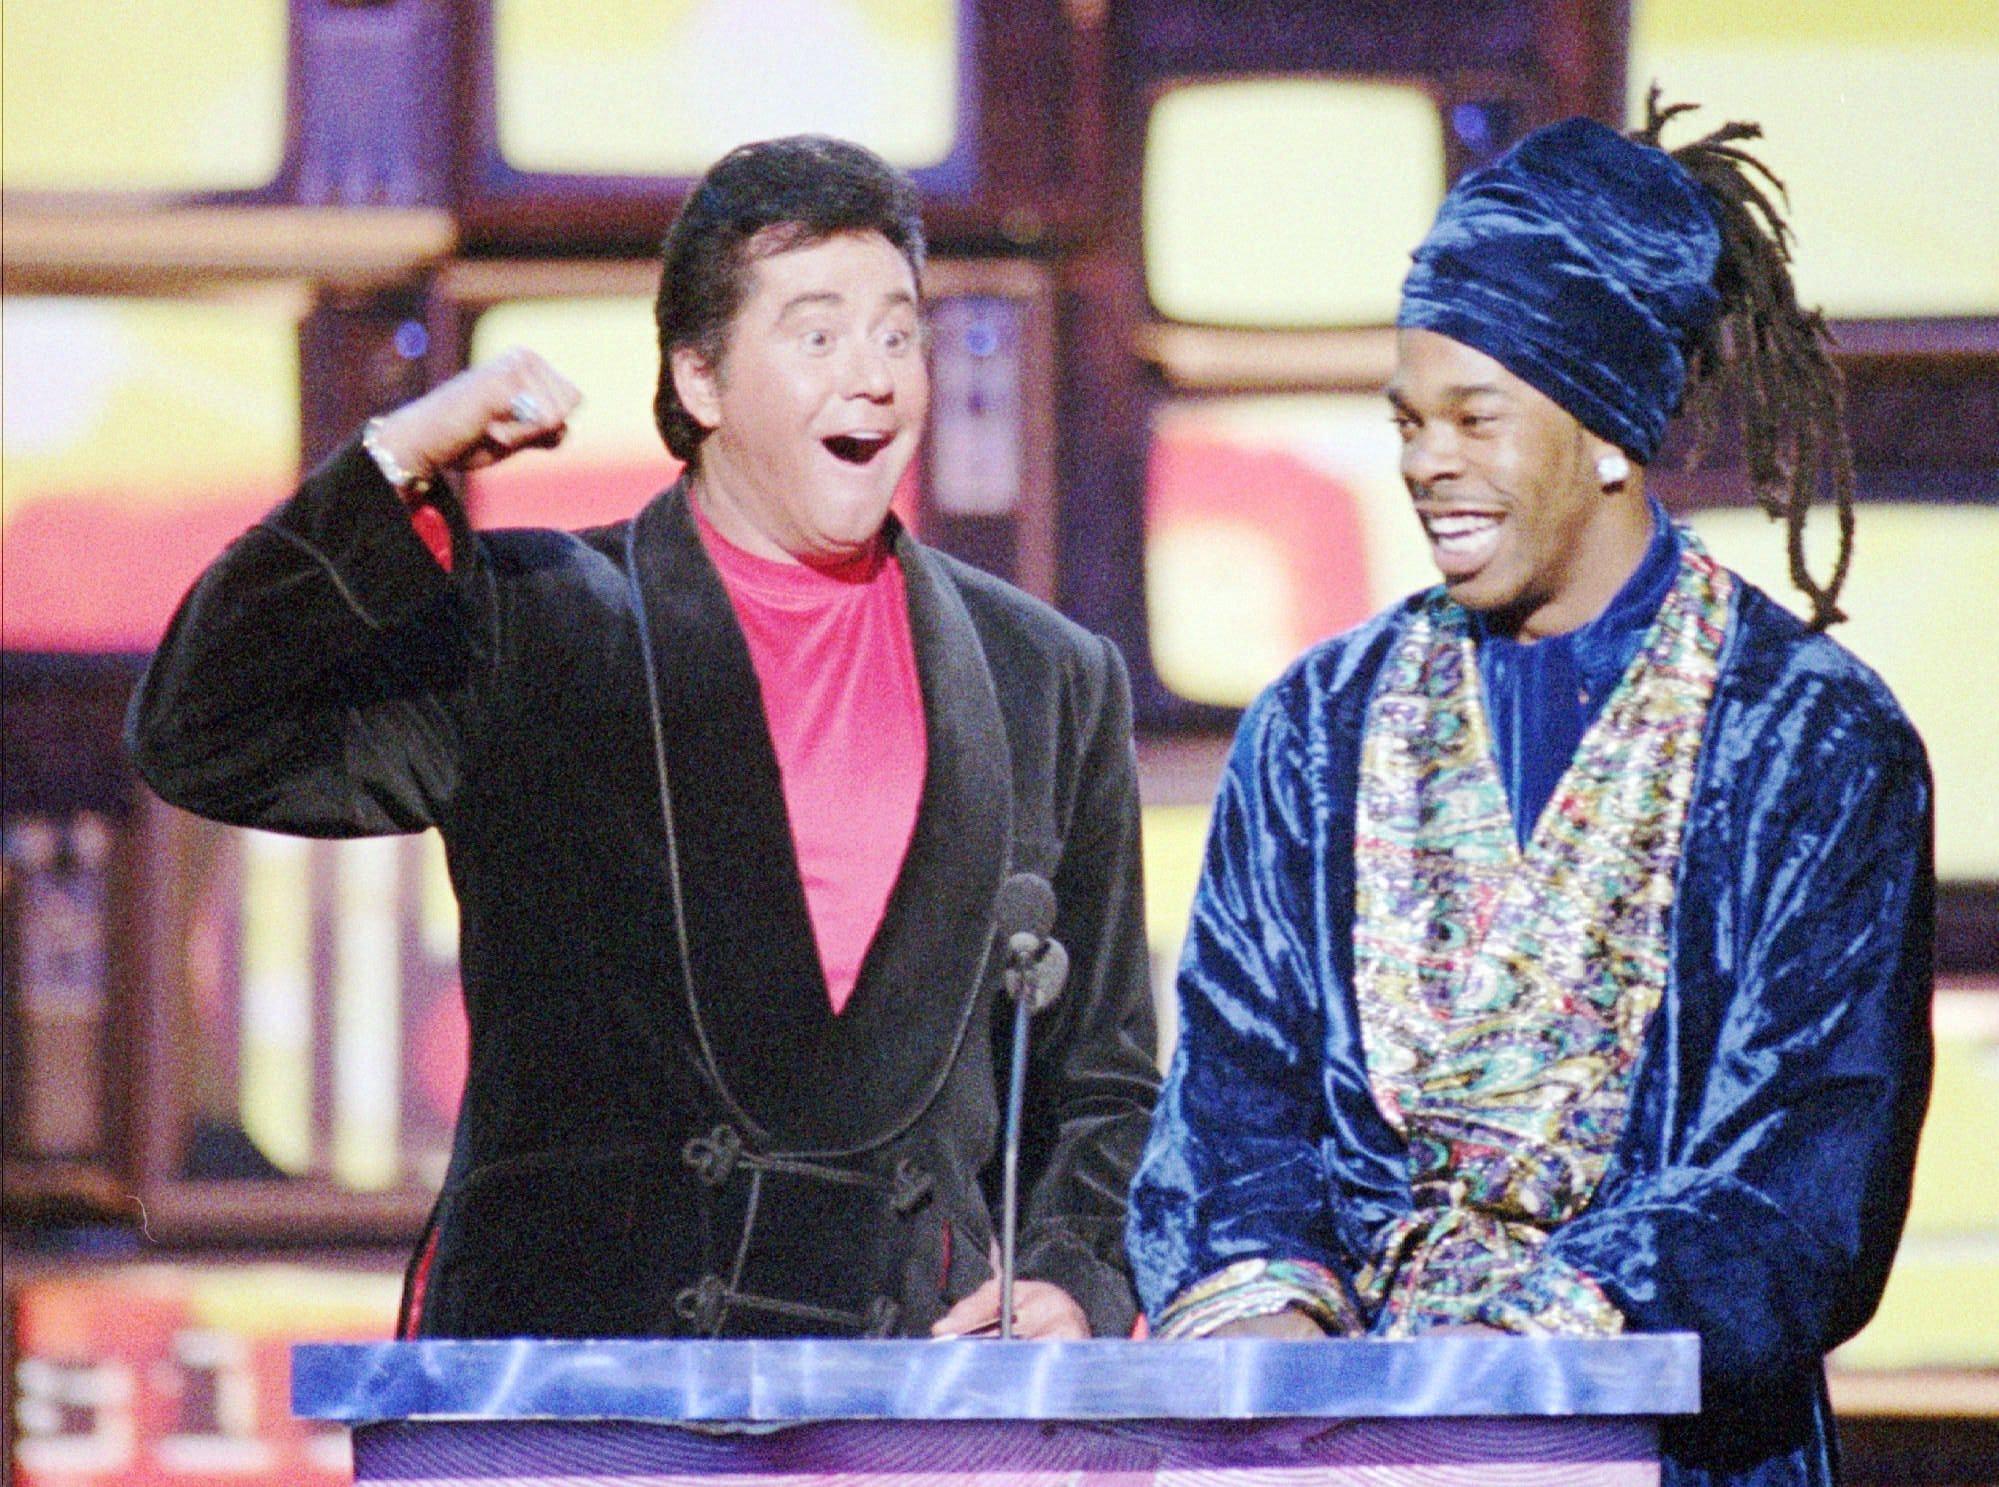 Wayne Newton (left) and Busta Rhymes appear on the Billboard Music Awards on Dec. 8, 1997.